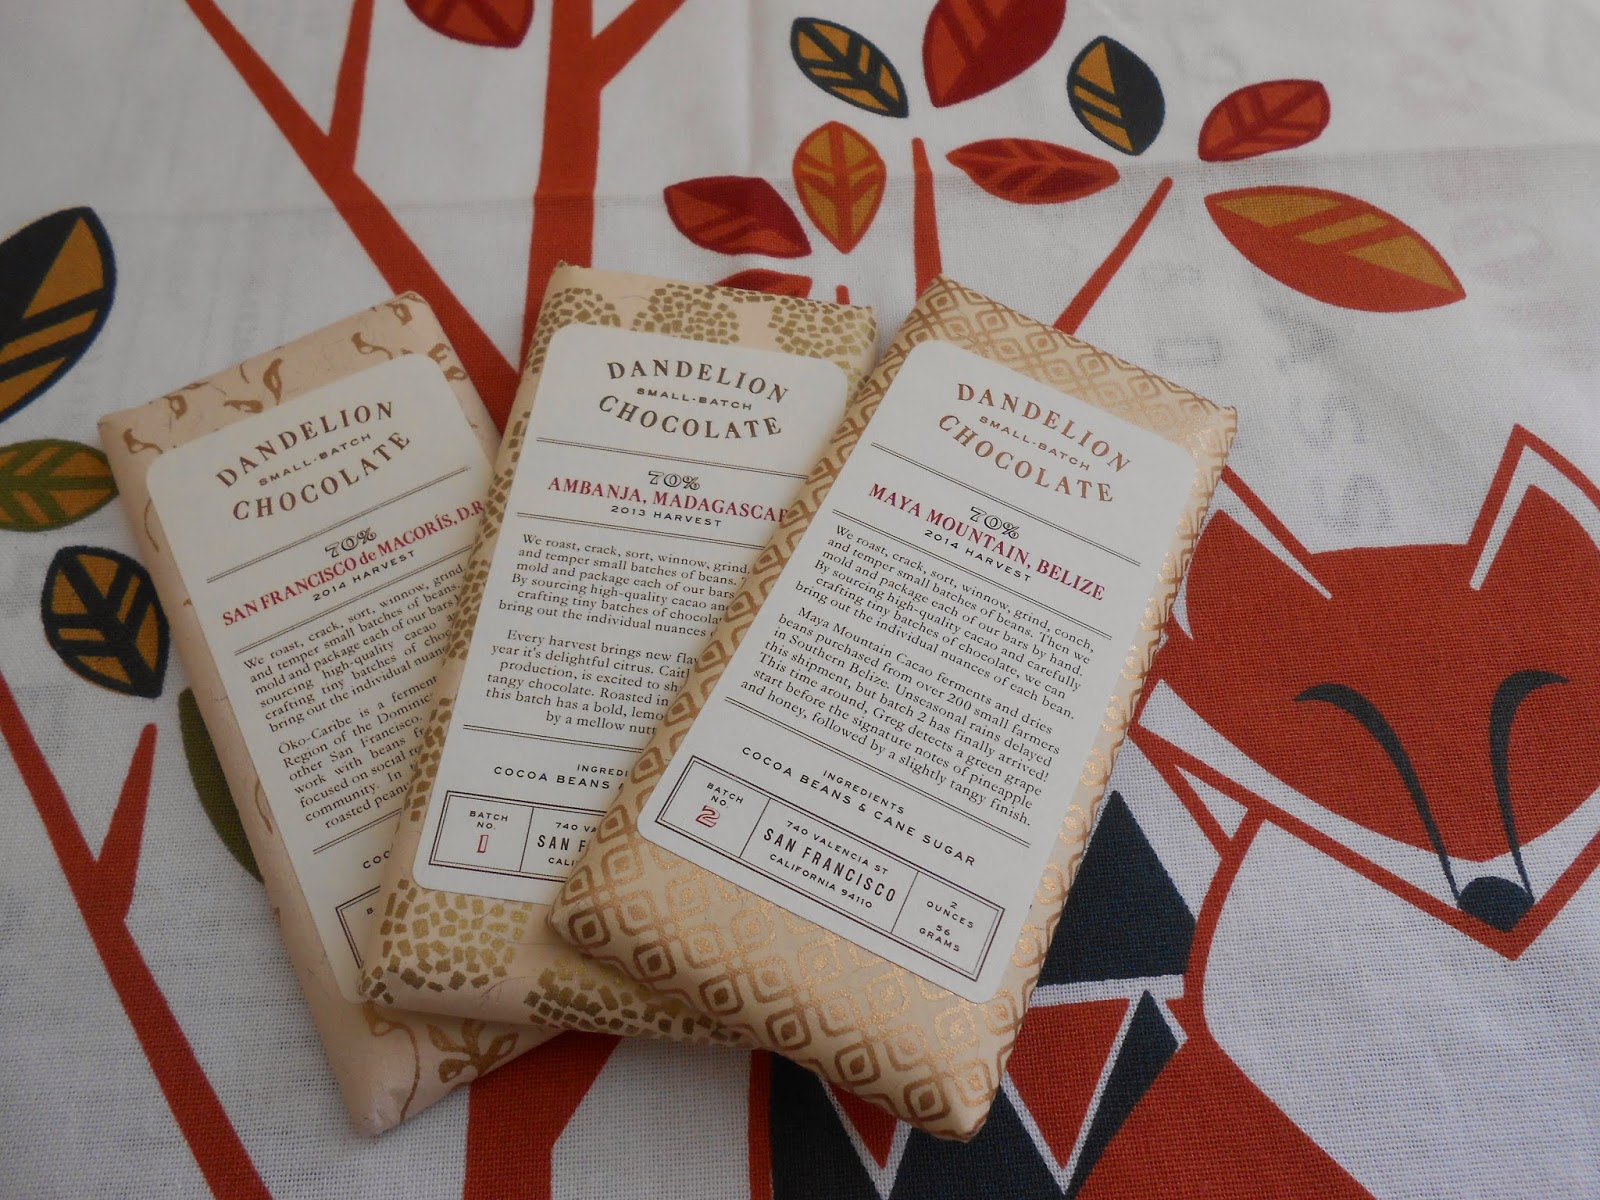 Dandelion Chocolate from San Francisco Review | Chocolate Speak